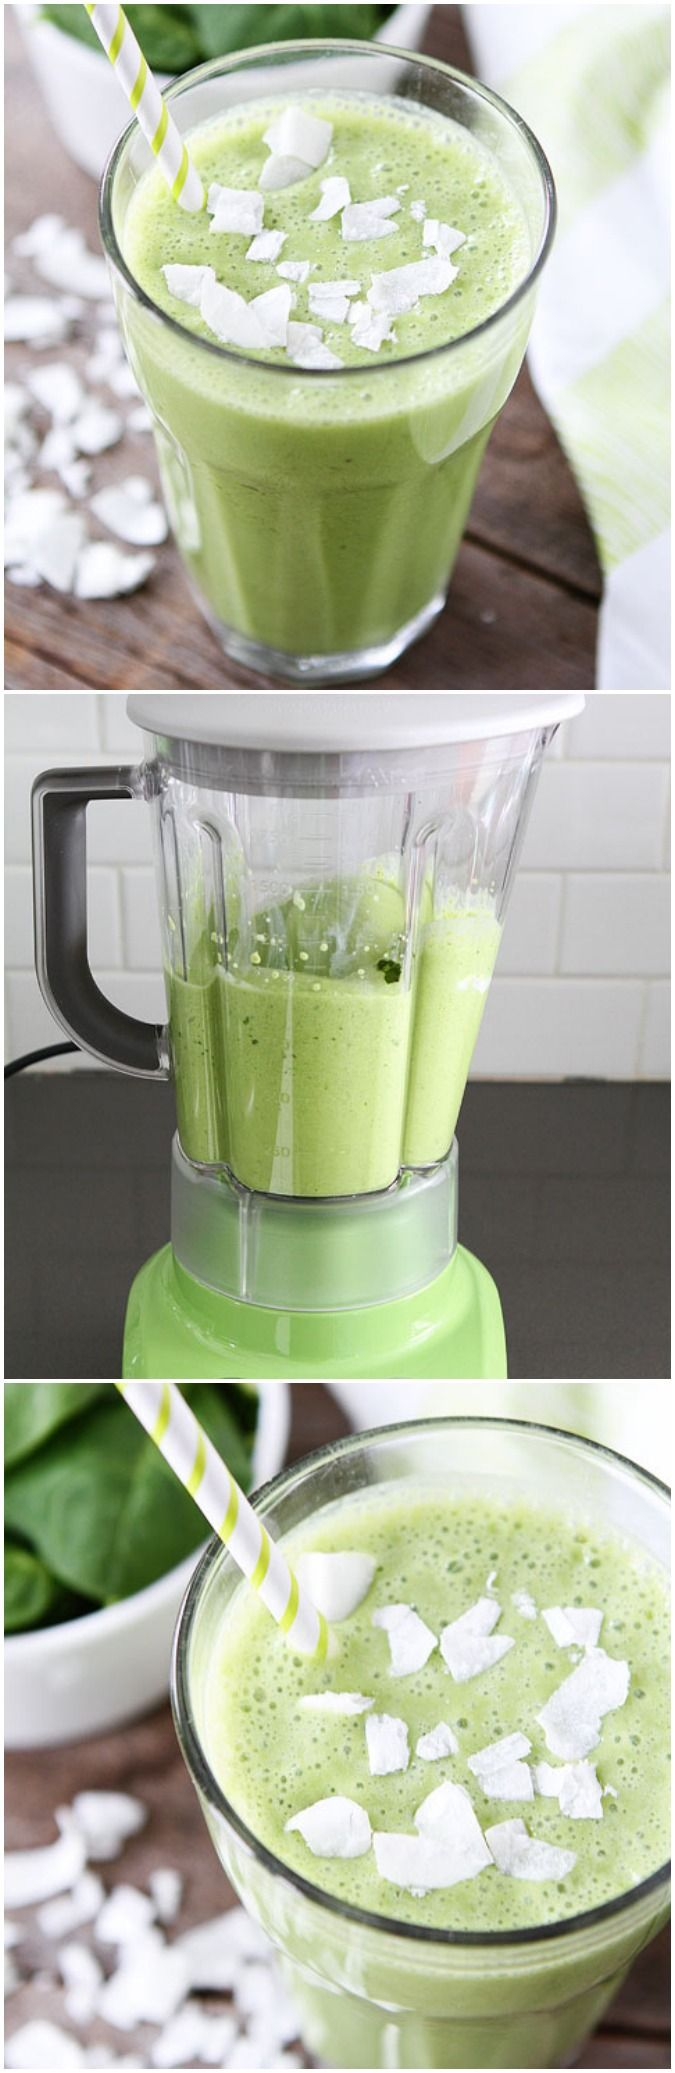 Healthy Breakfast! Coconut Green Smoothie Recipe